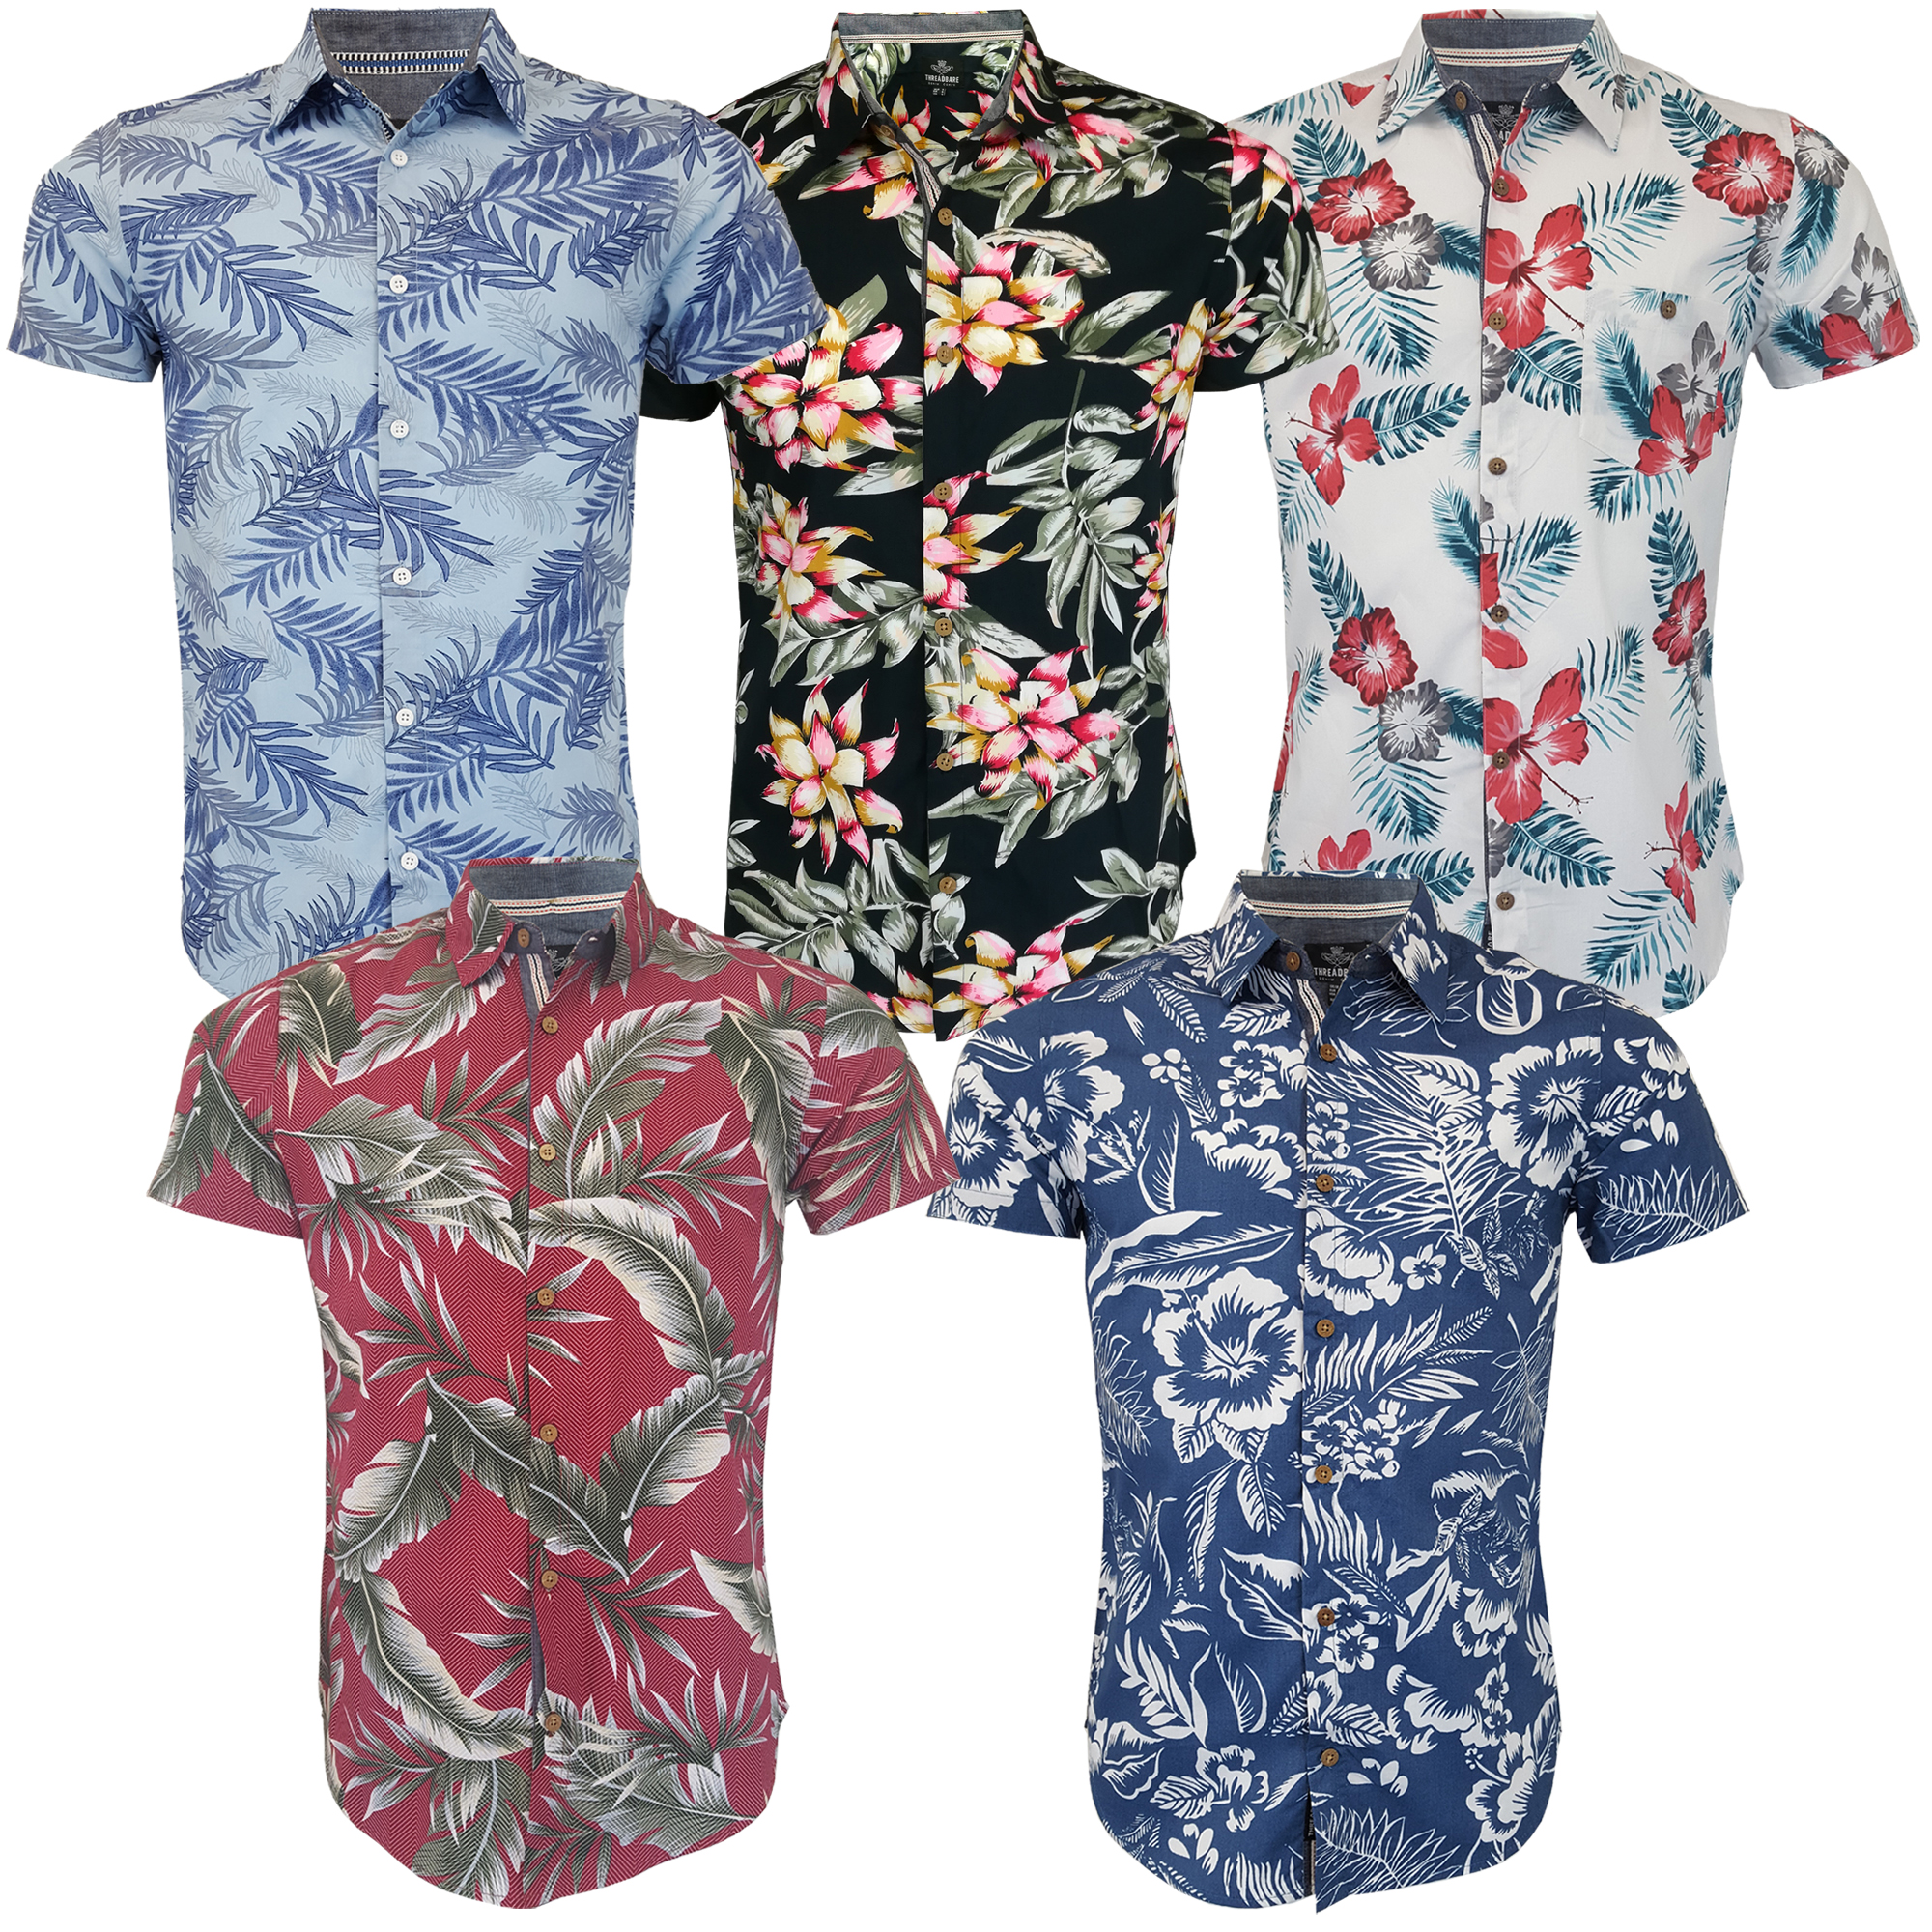 Herren-Hawaii-Hemd-abgezehrte-Blumendruck-Kurzaermeliges-Strand-Urlaub-Sommer-Neu Indexbild 4